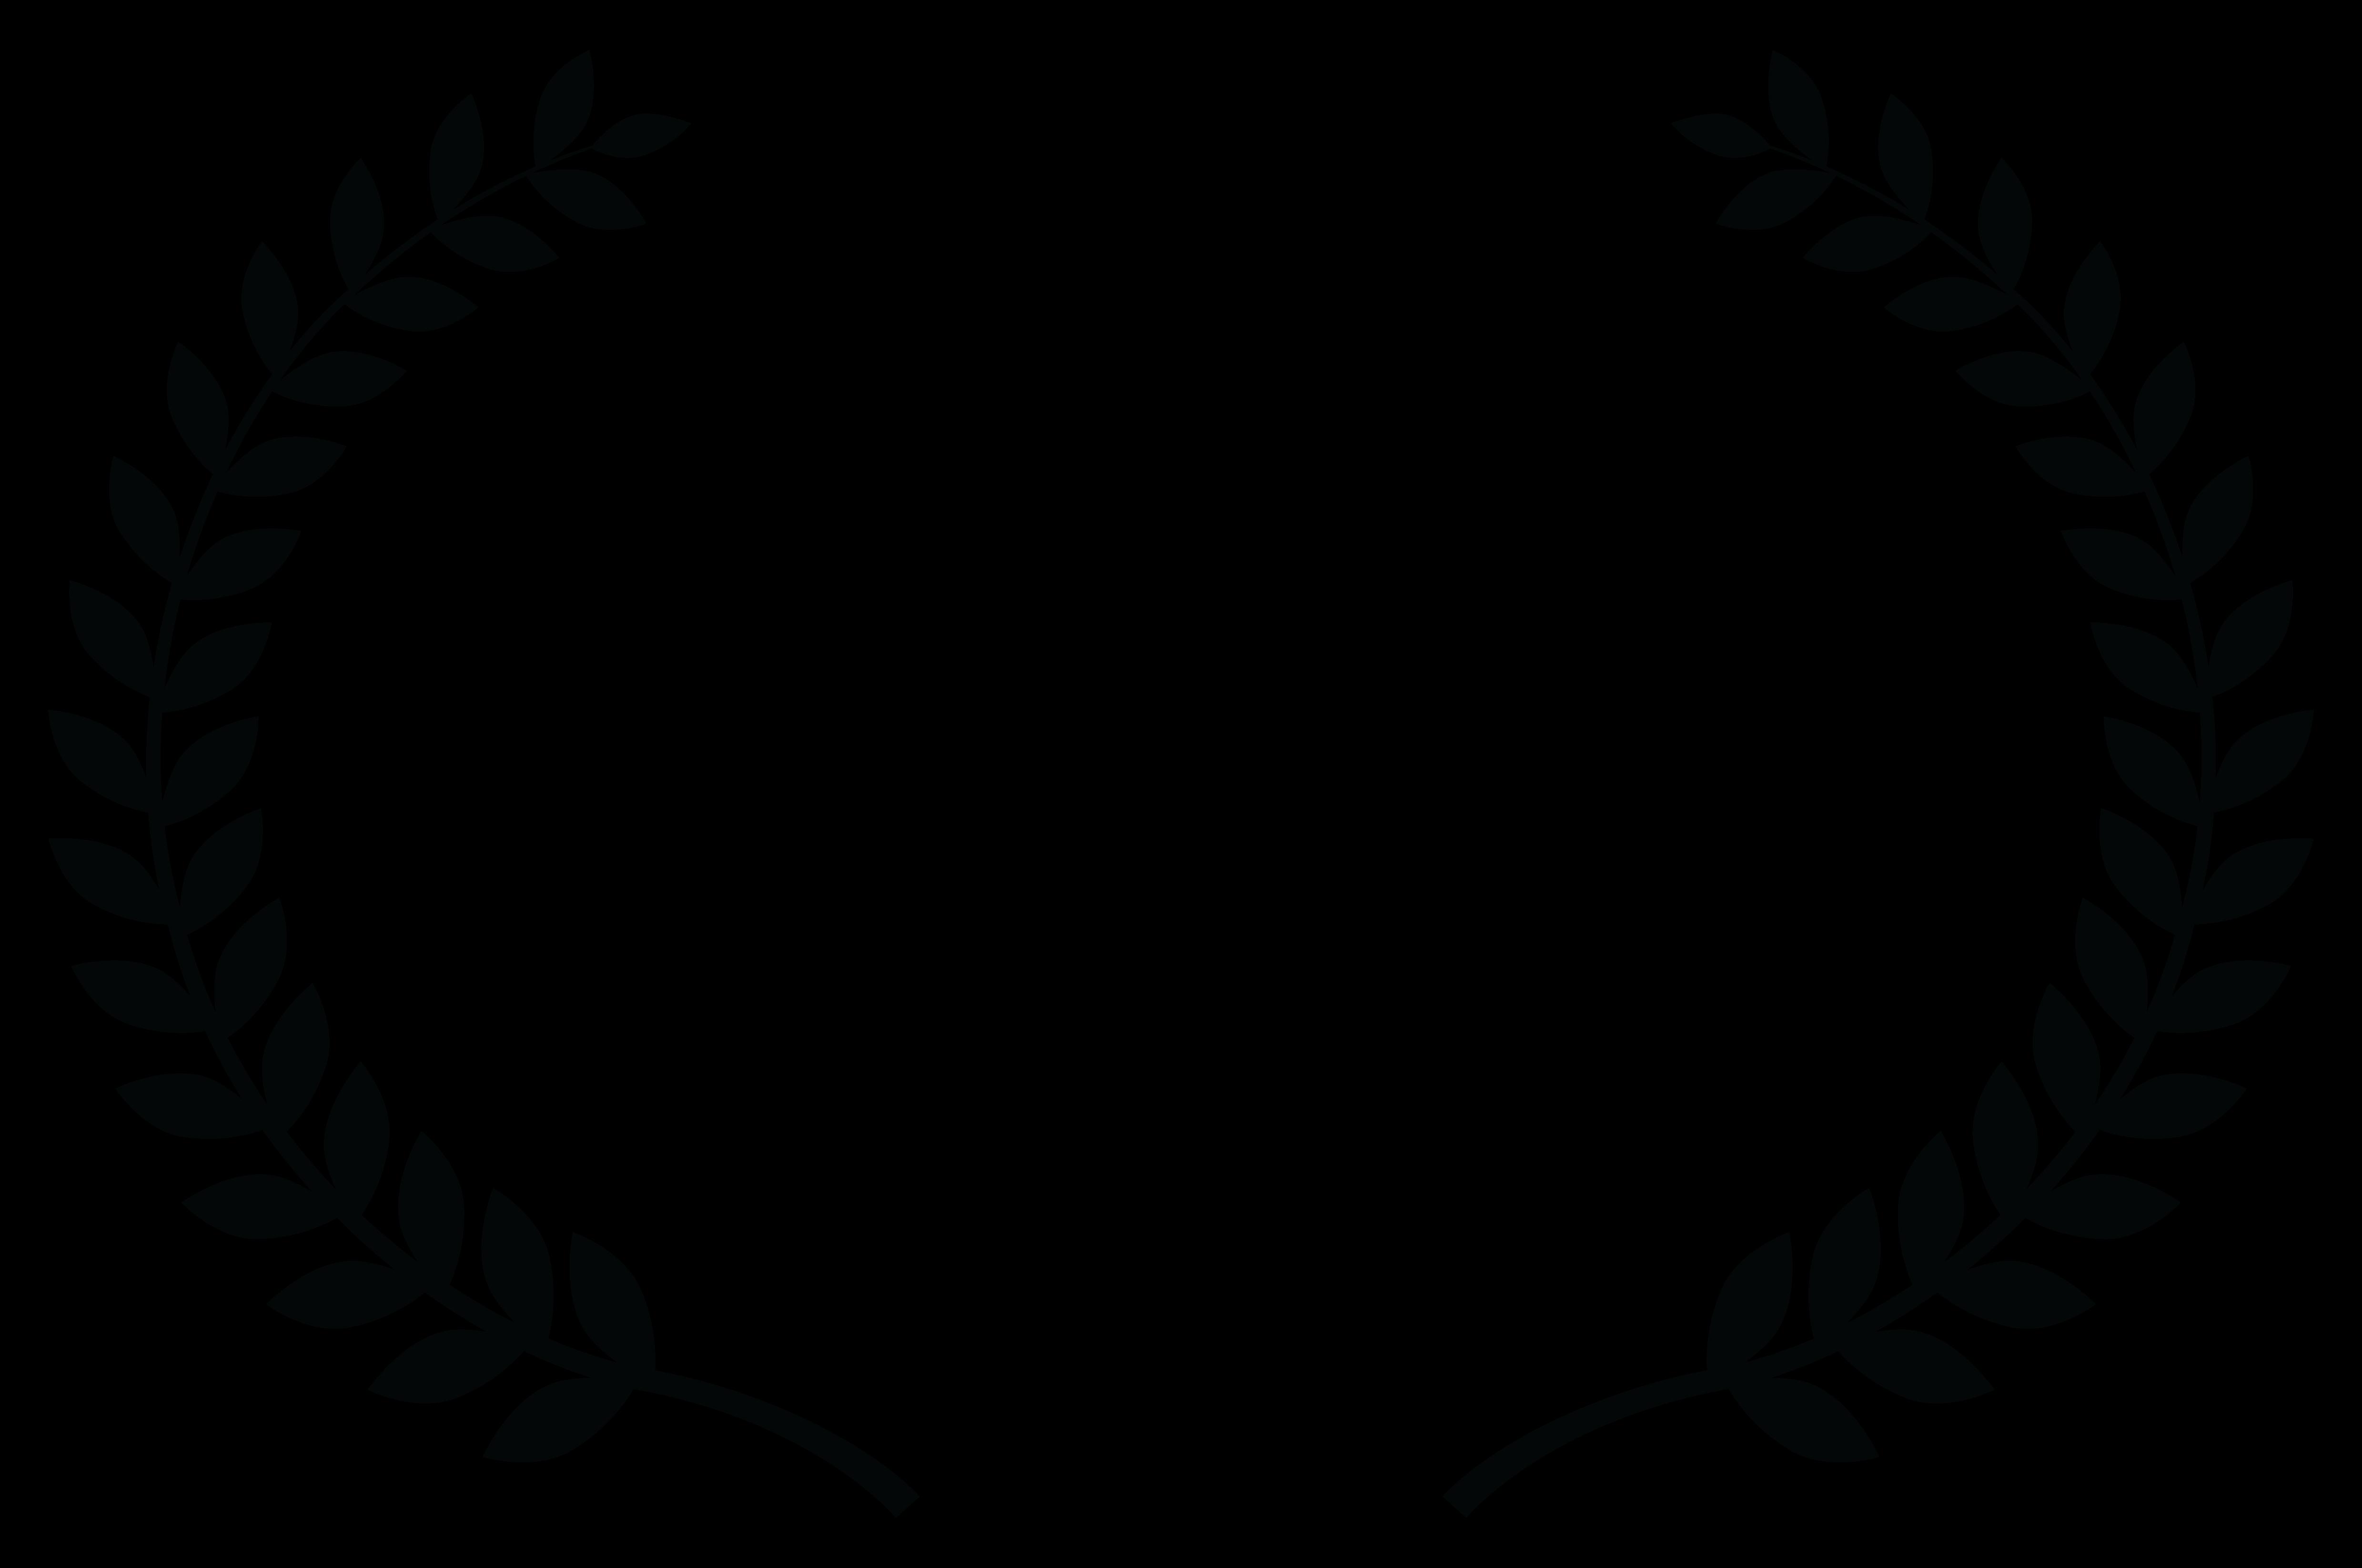 OFFICIALSELECTION-Fisura-InternationalFilmFestival2020